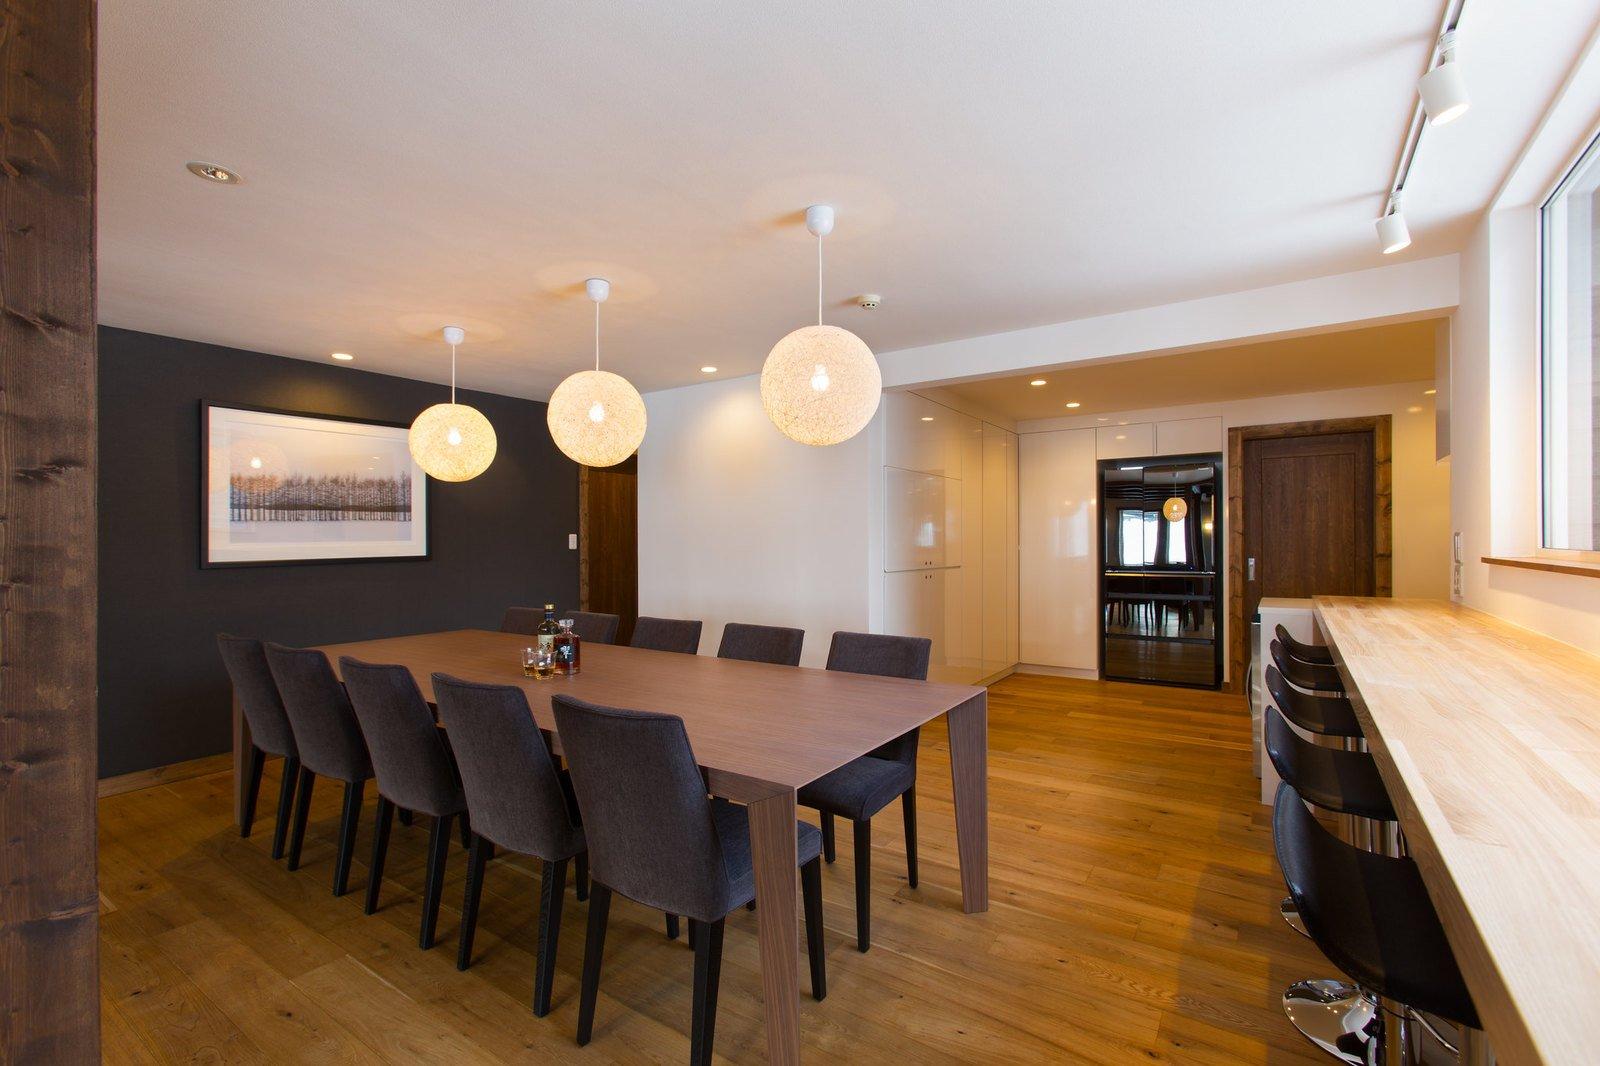 The dining room in 7 bedroom house Greystone in Niseko.